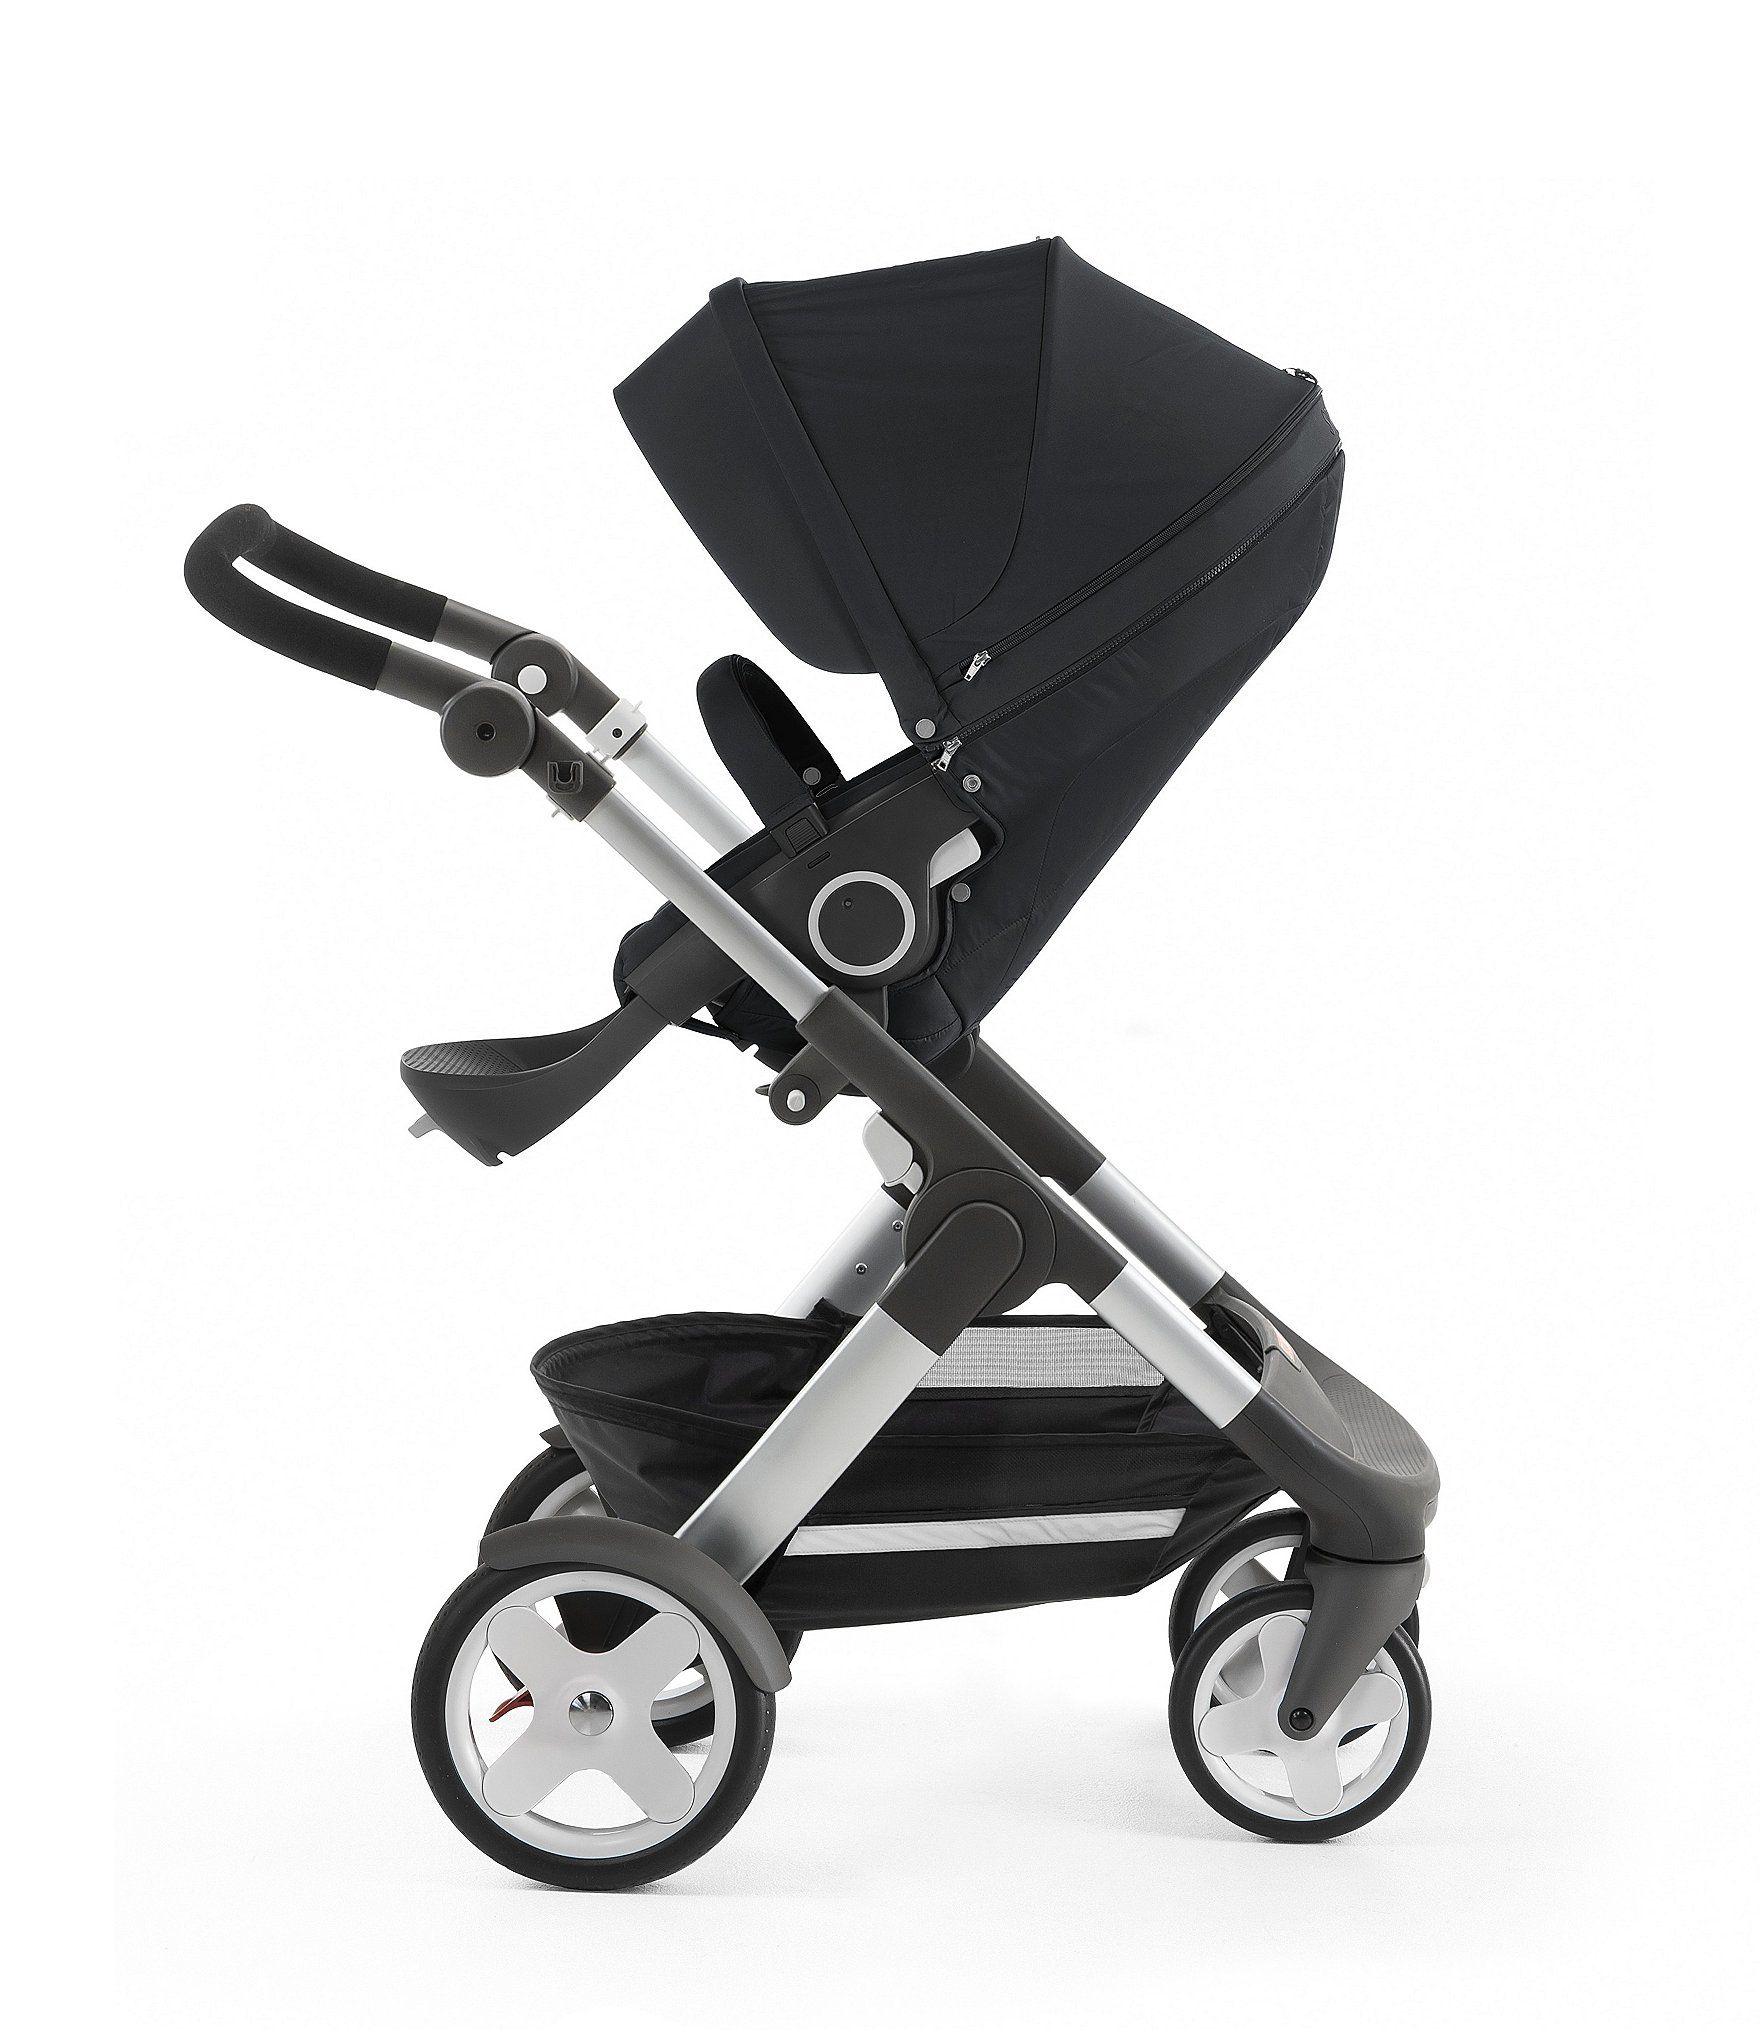 Stokke Trailz Classic Stroller Black N/A in 2020